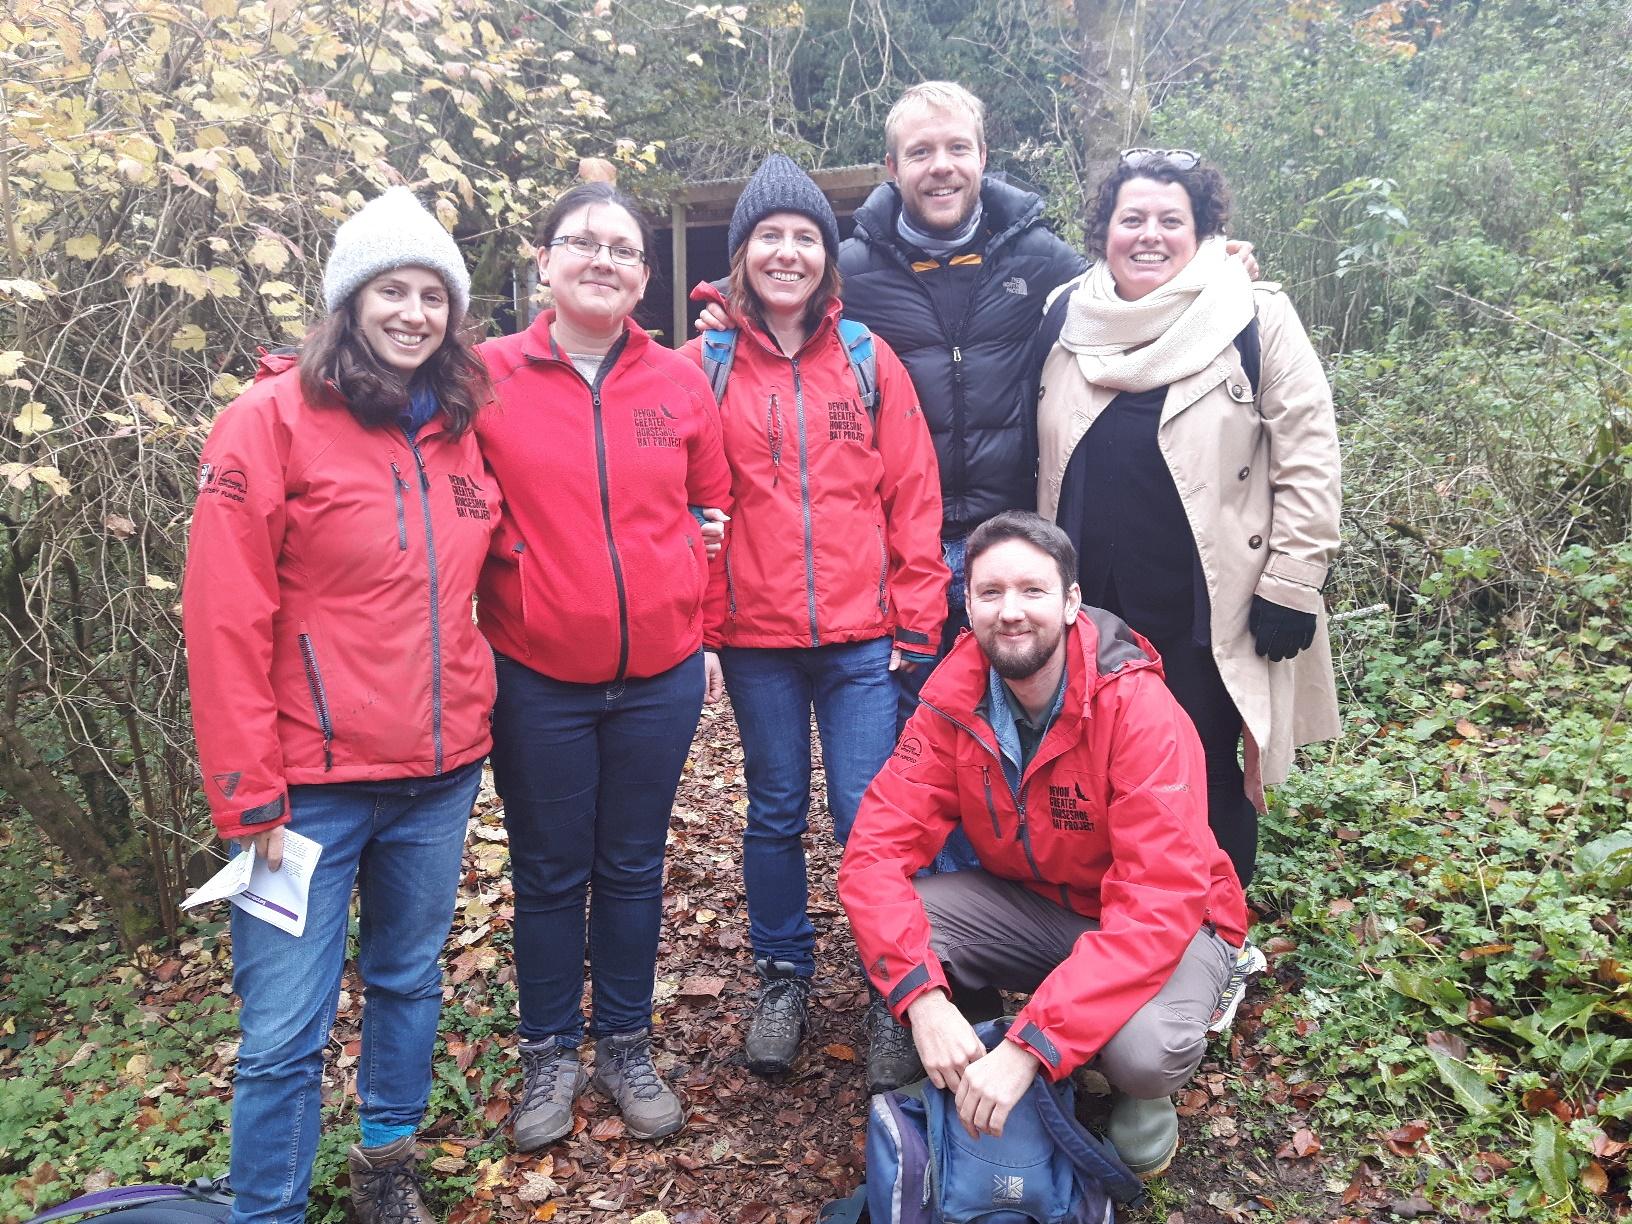 Team Bat: (L-R) Anna, Land Advisor; Ruth, Project Manager; Helen, Community Officer; Finch, PhD researcher; Mike, Land Advisor; Lizzie, Community Contractor